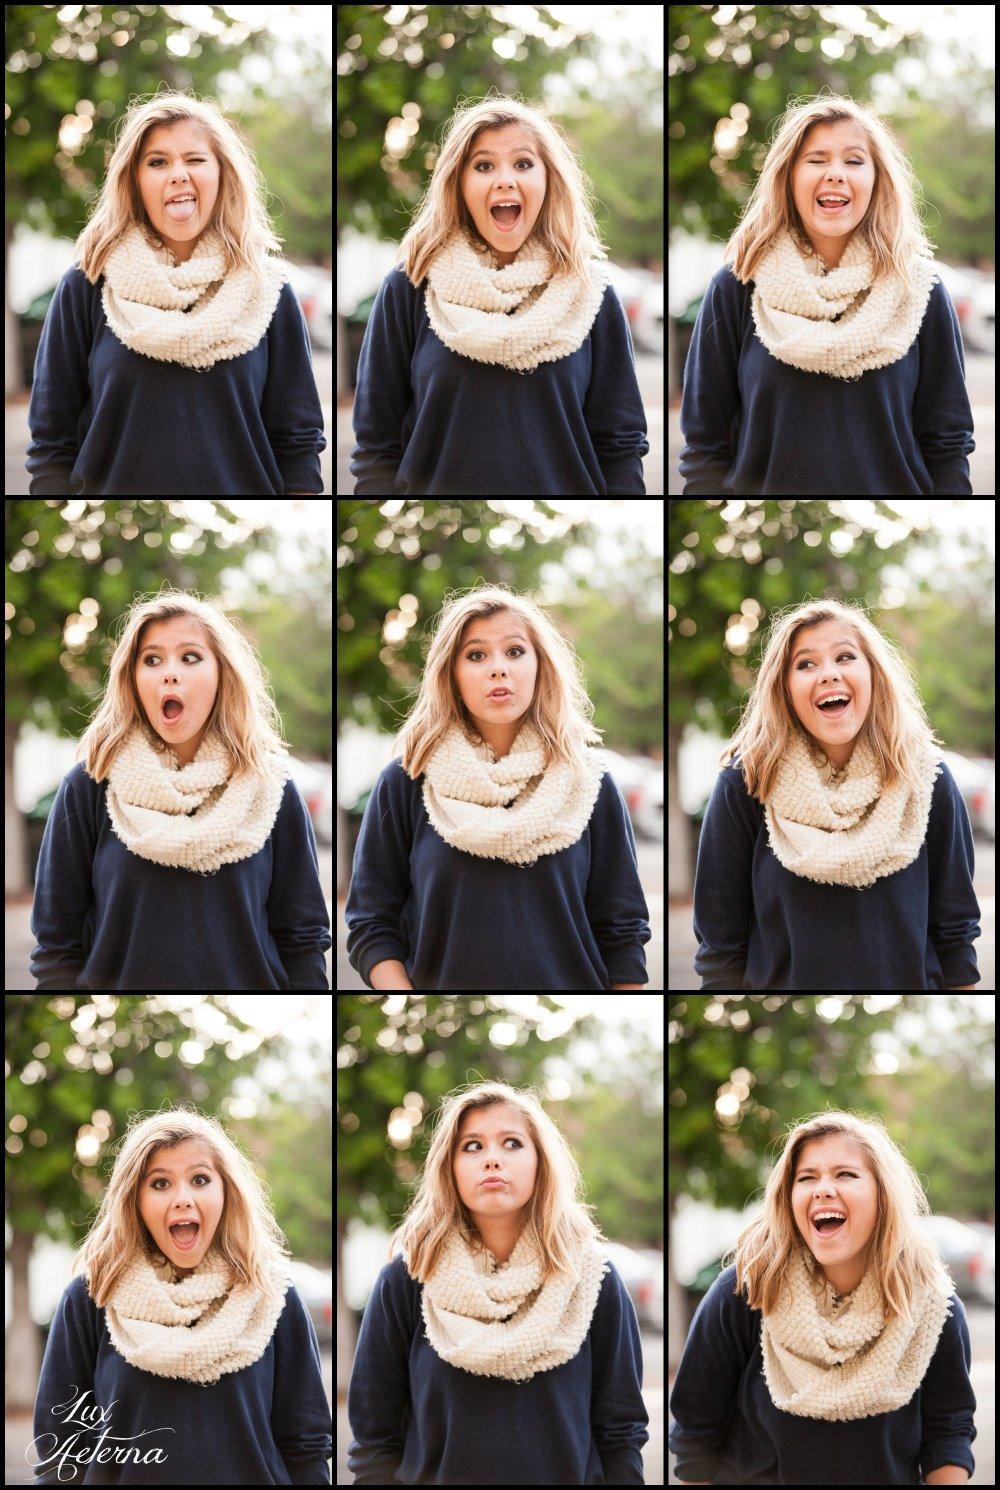 cassia-karin-photography-redlands-ca-blonde-girl-white-sweater-scarf-blue-sweatshirt-red-shorts140.jpg